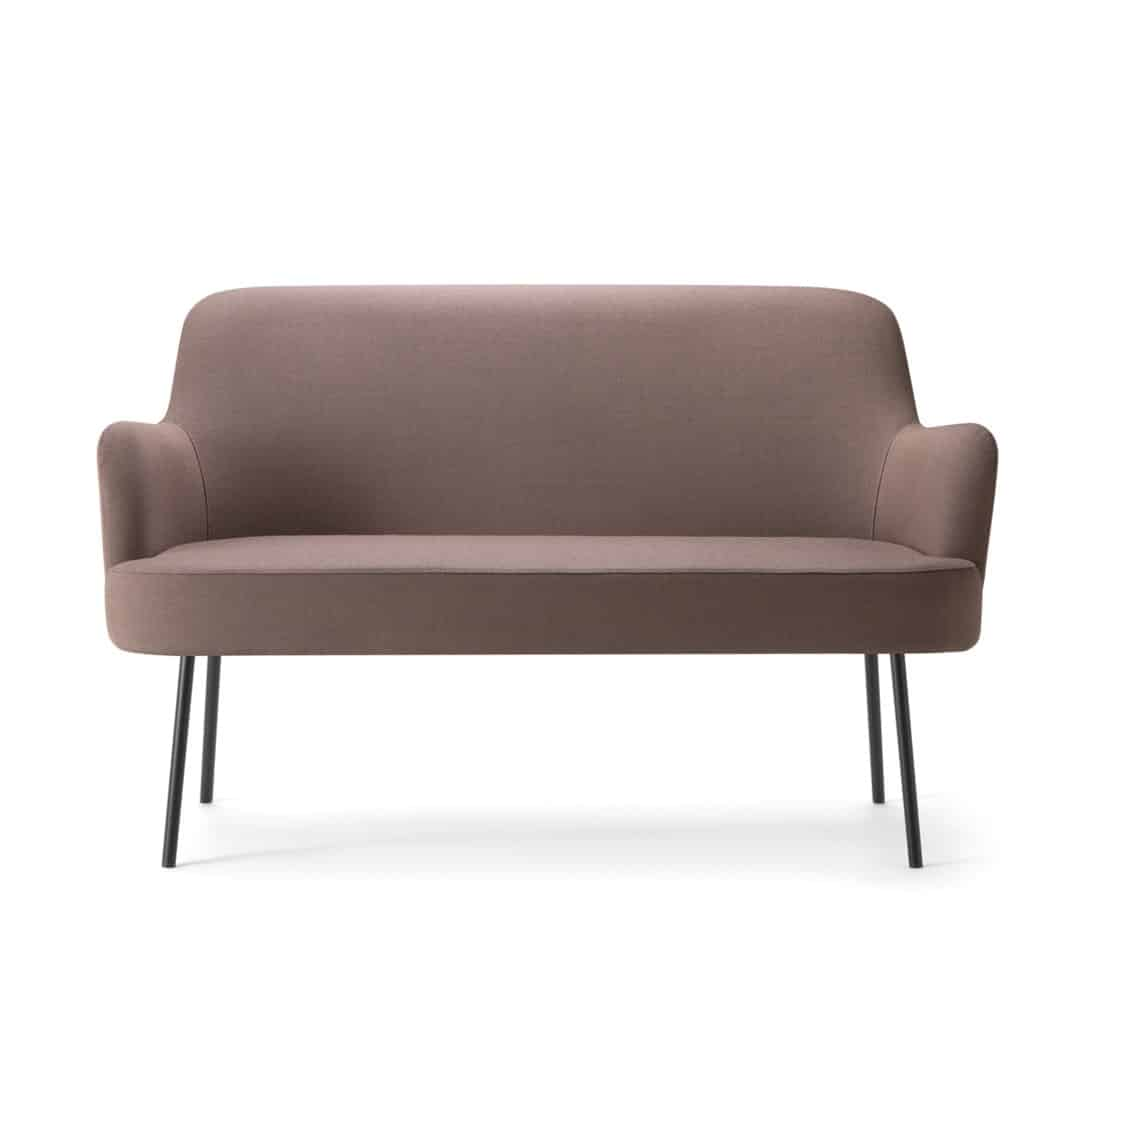 Da Vinci Sofa 09 2 Seater DeFrae Contract Furniture Metal Legs